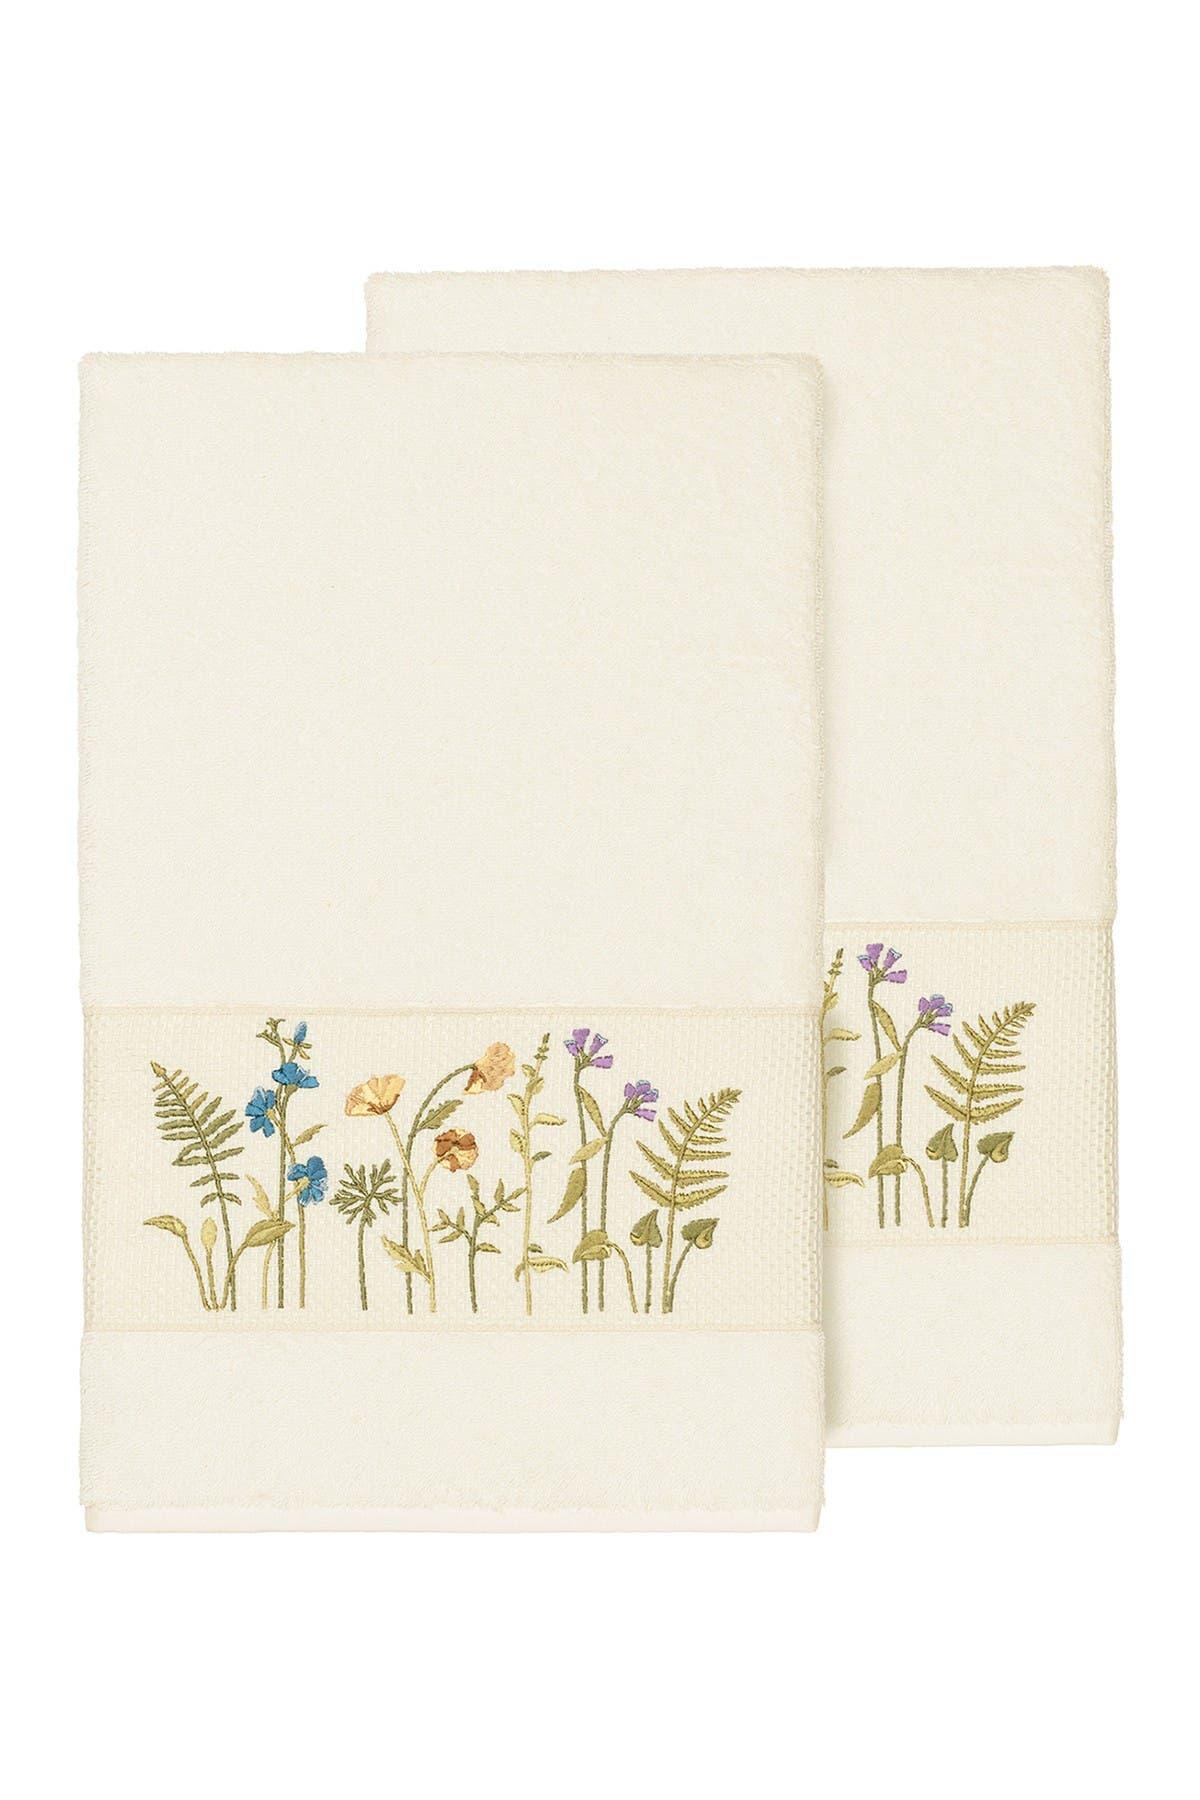 Image of LINUM HOME Serenity Embellished Bath Towel - Set of 2 - Cream